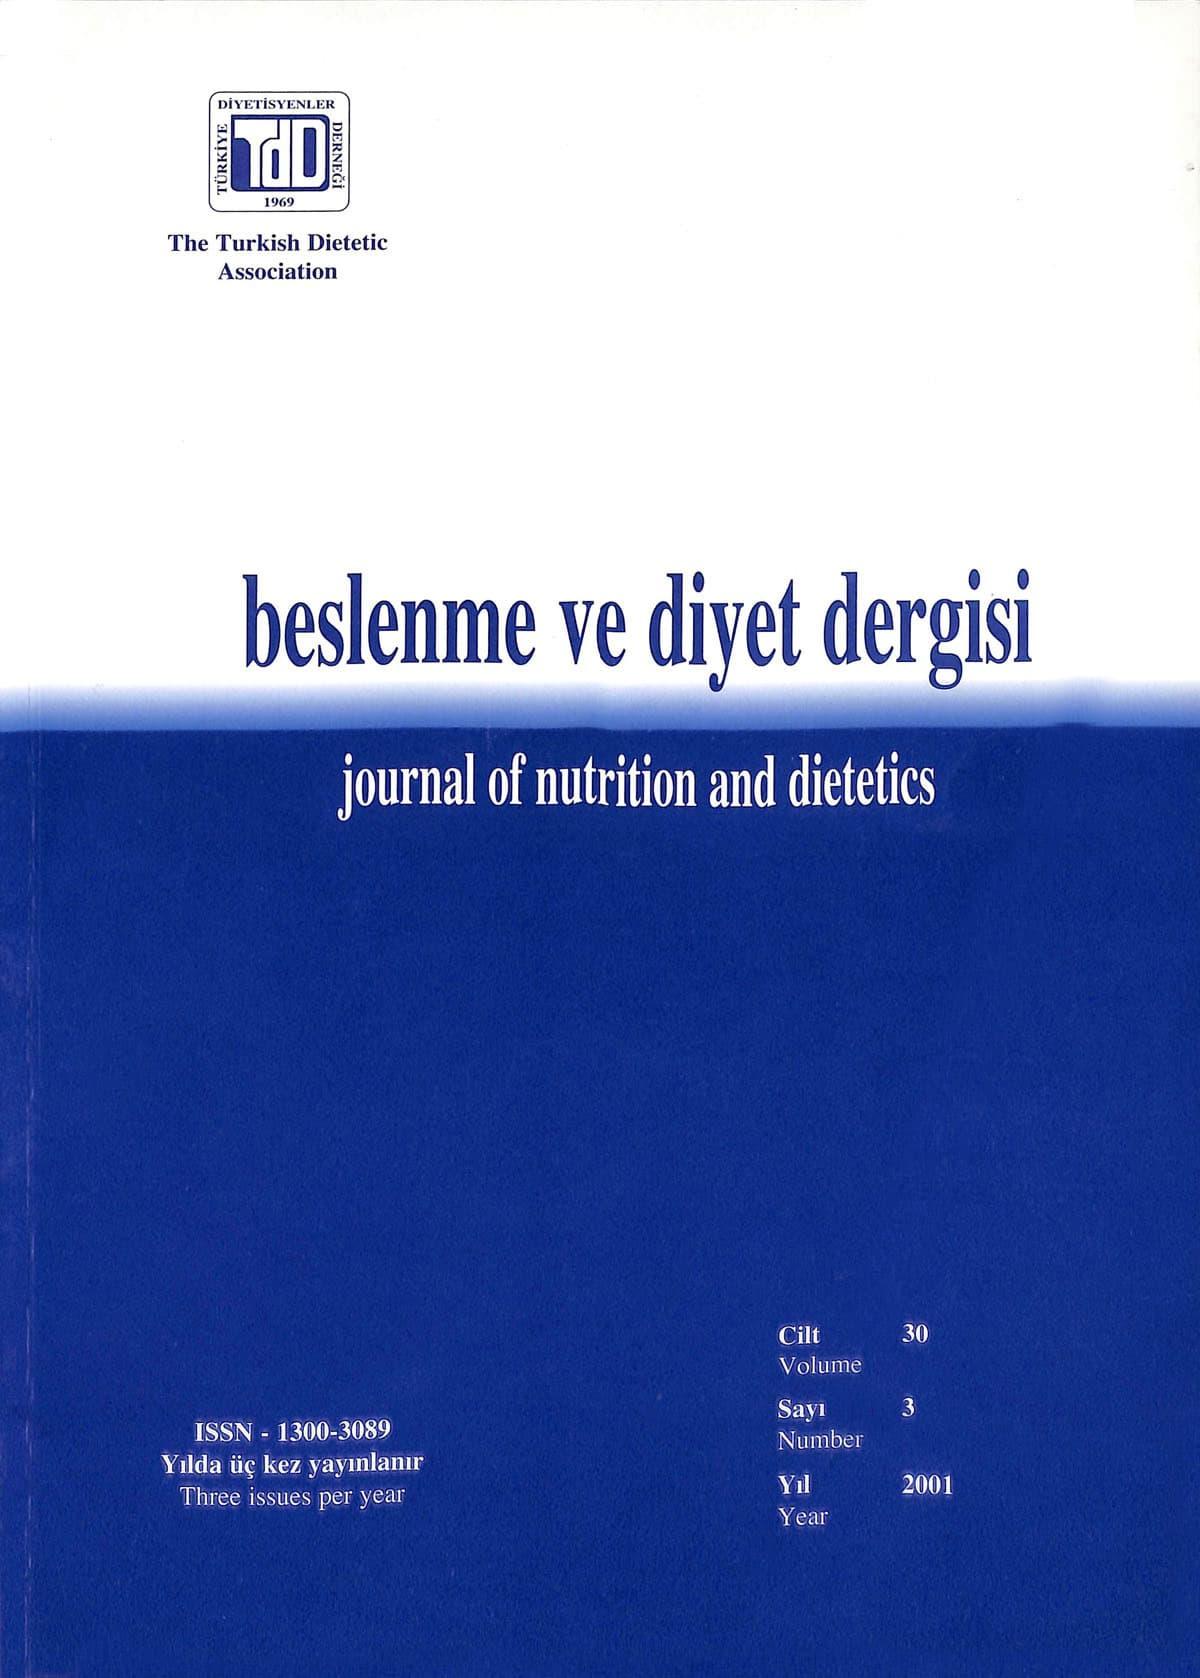 Cilt 30 Sayı 2 (2001)